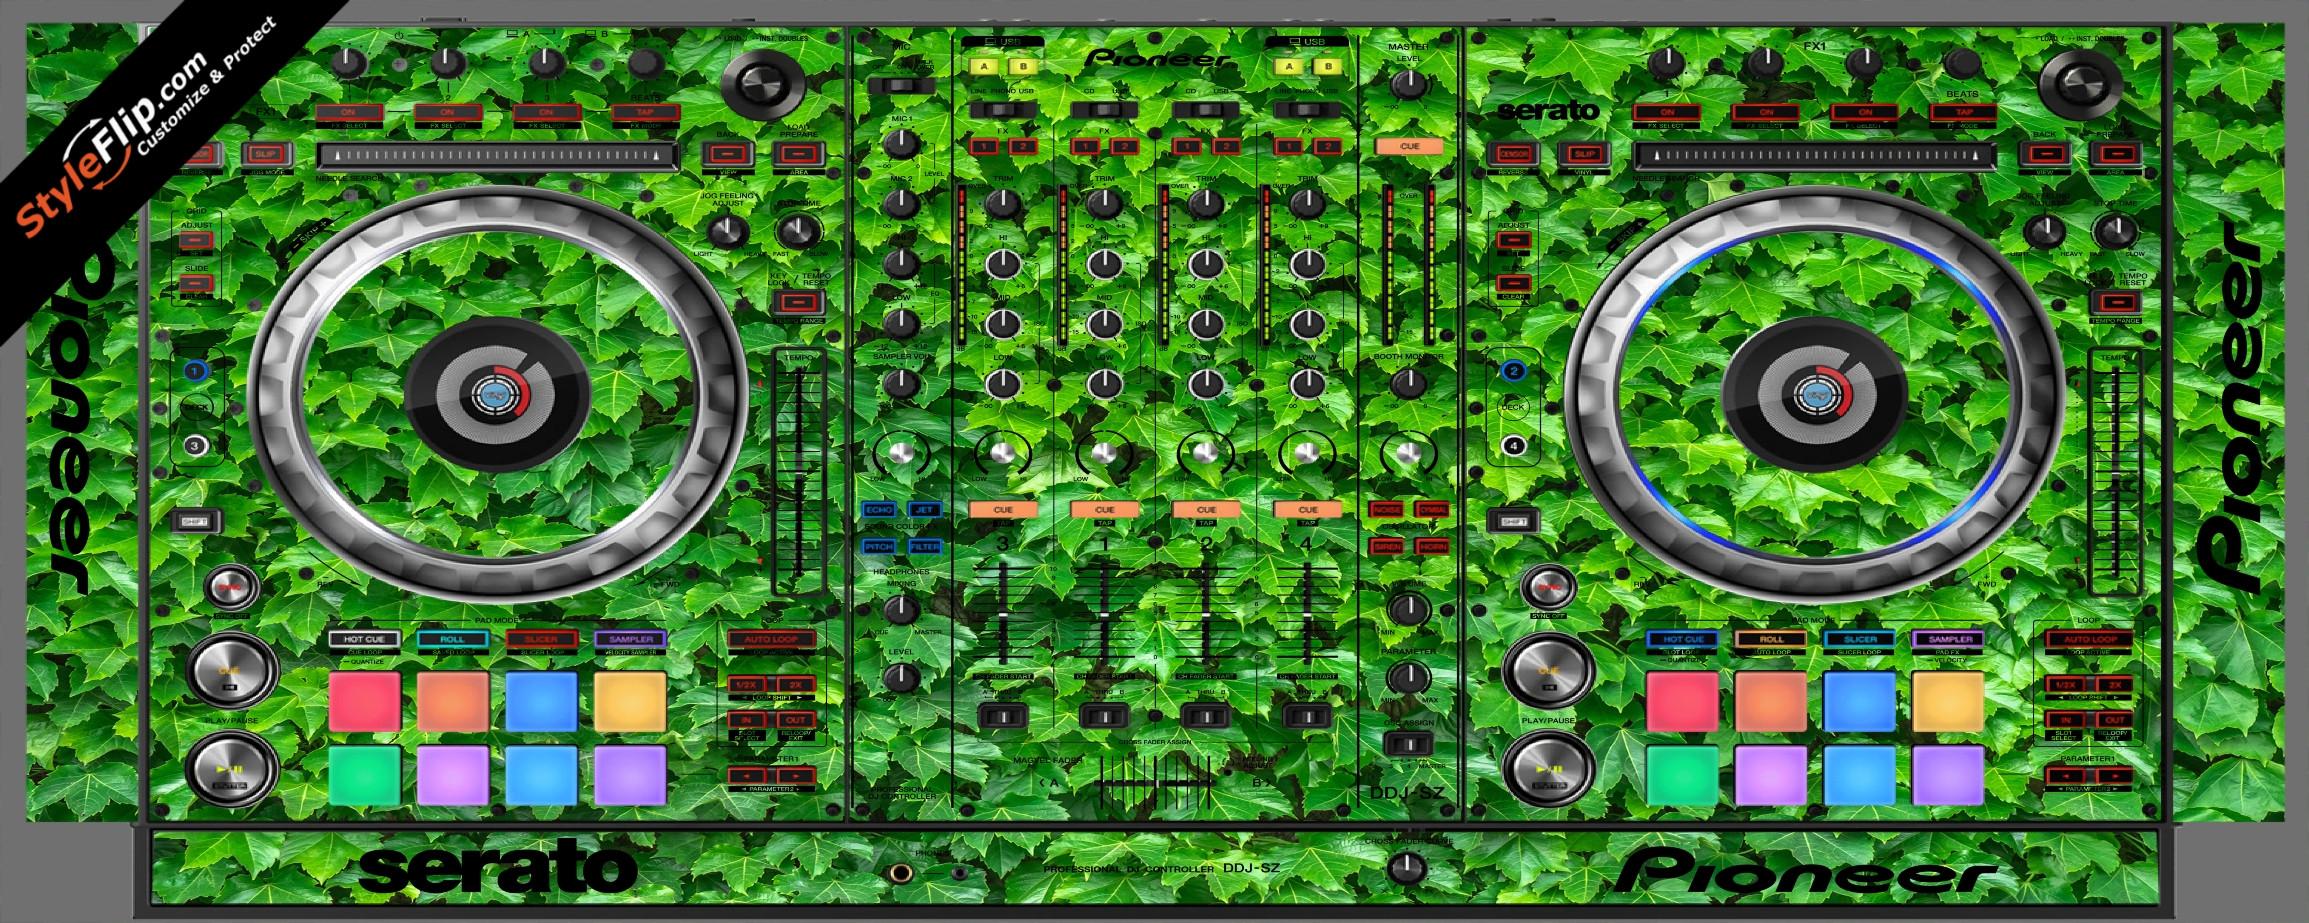 Greenery  Pioneer DDJ-SZ